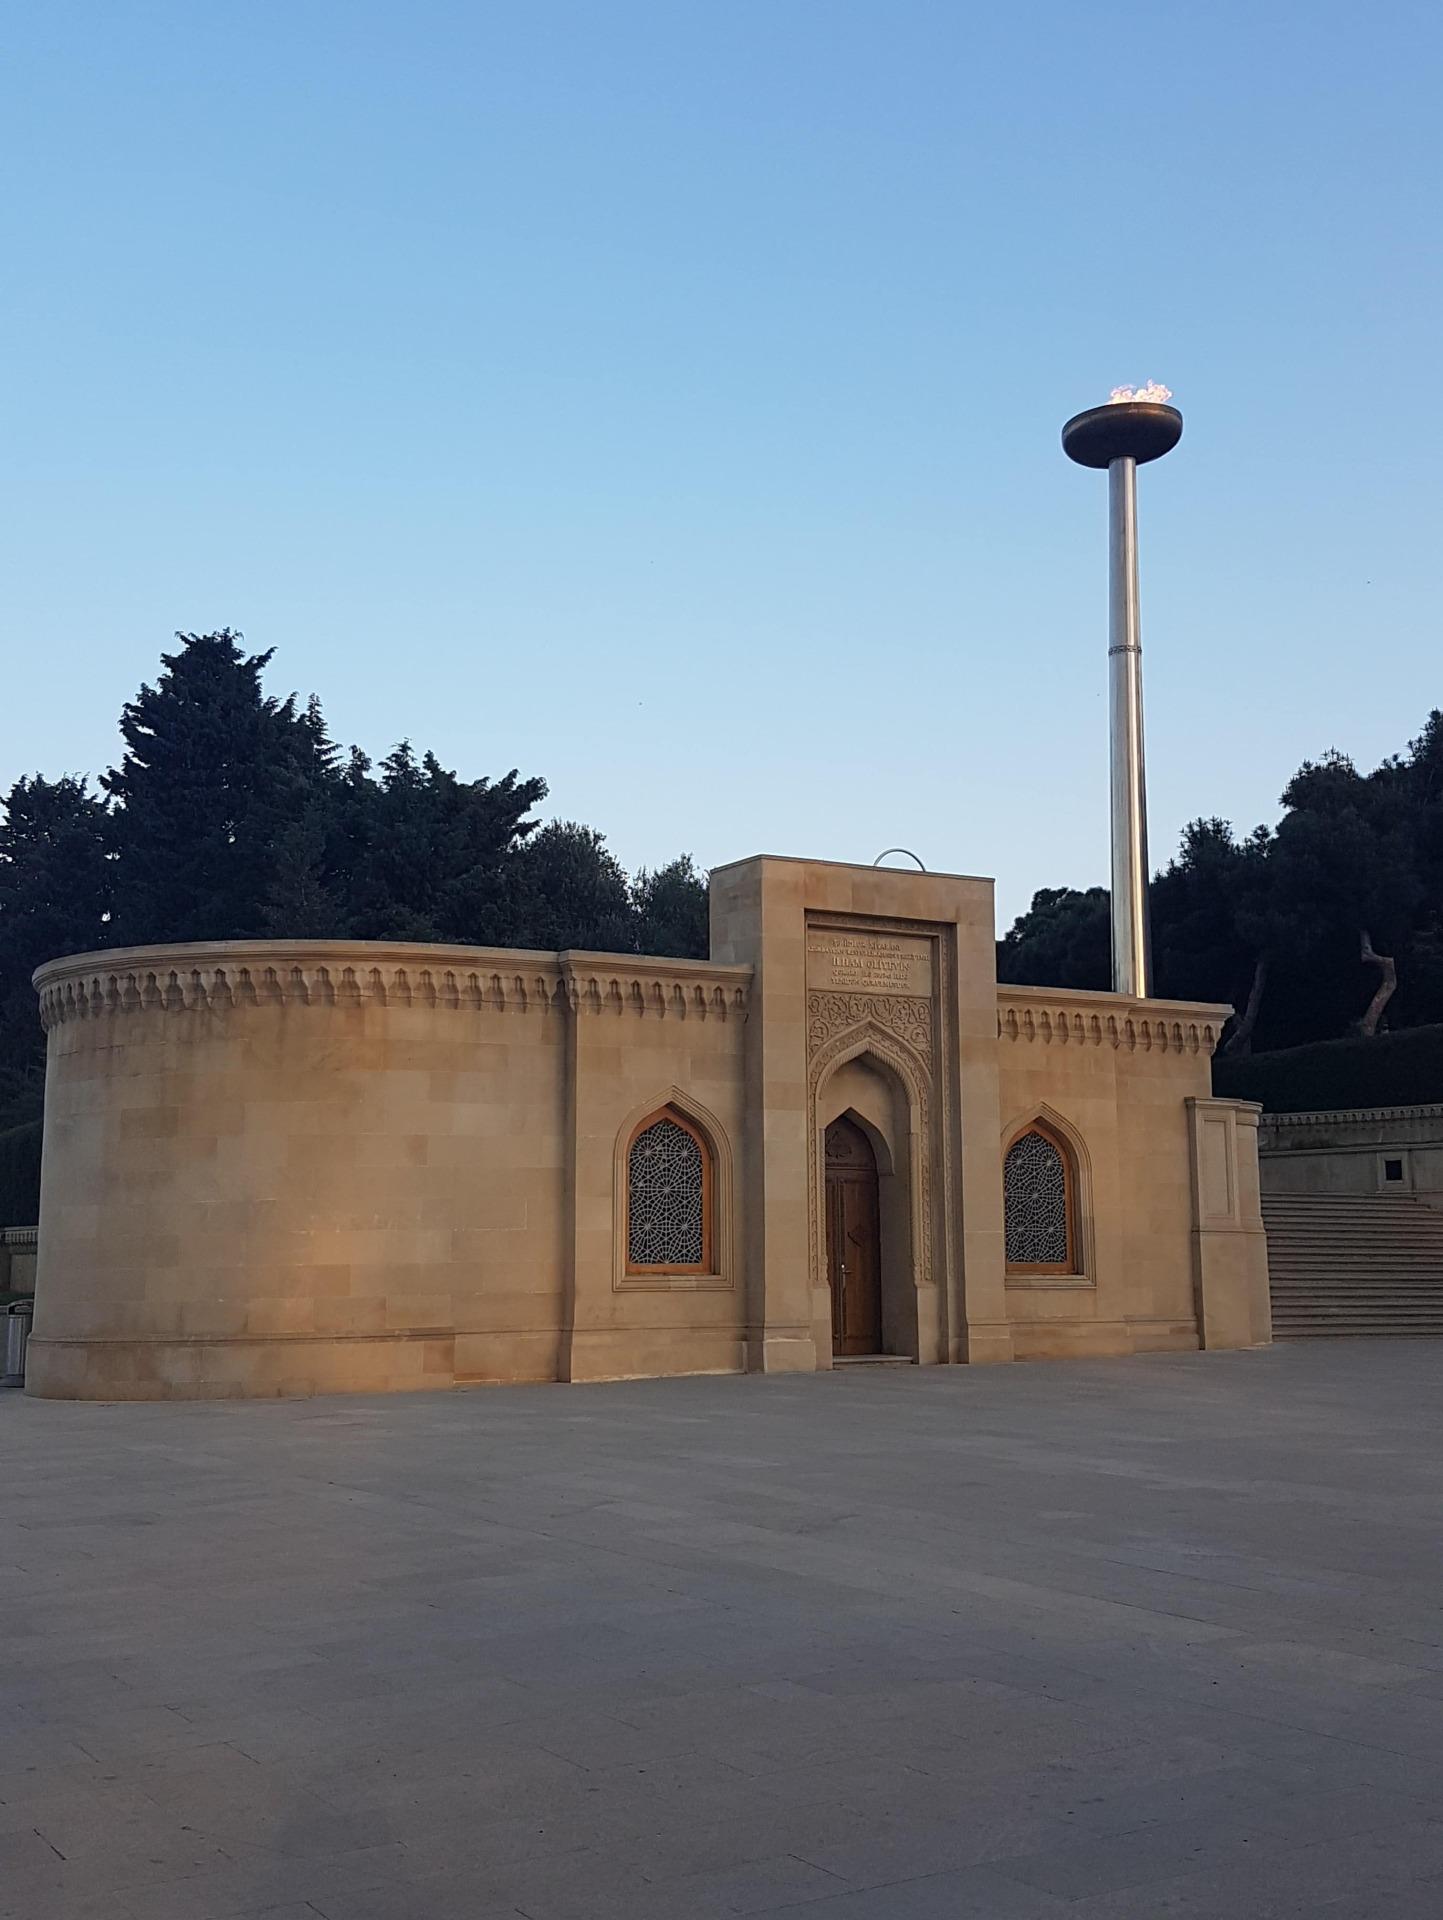 The Şahidlər Xiyabani is dedicated to the martyrs' of Azerbaijan.